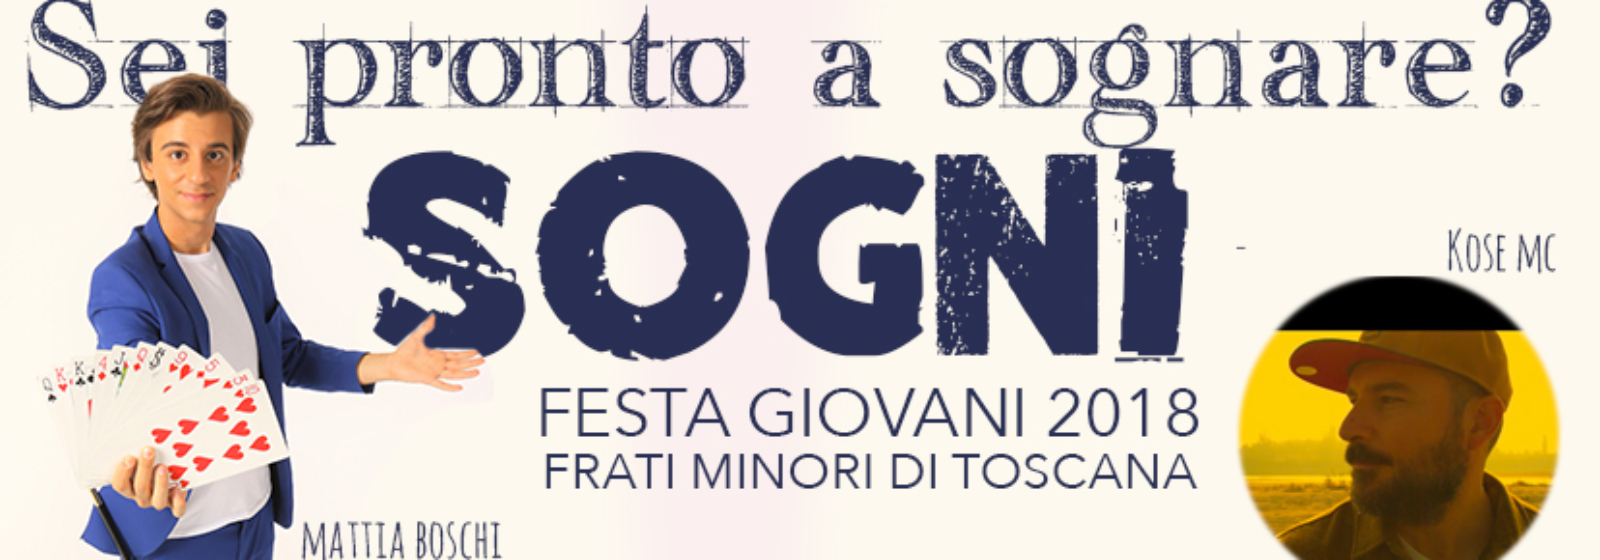 Festa Giovani 2018 1